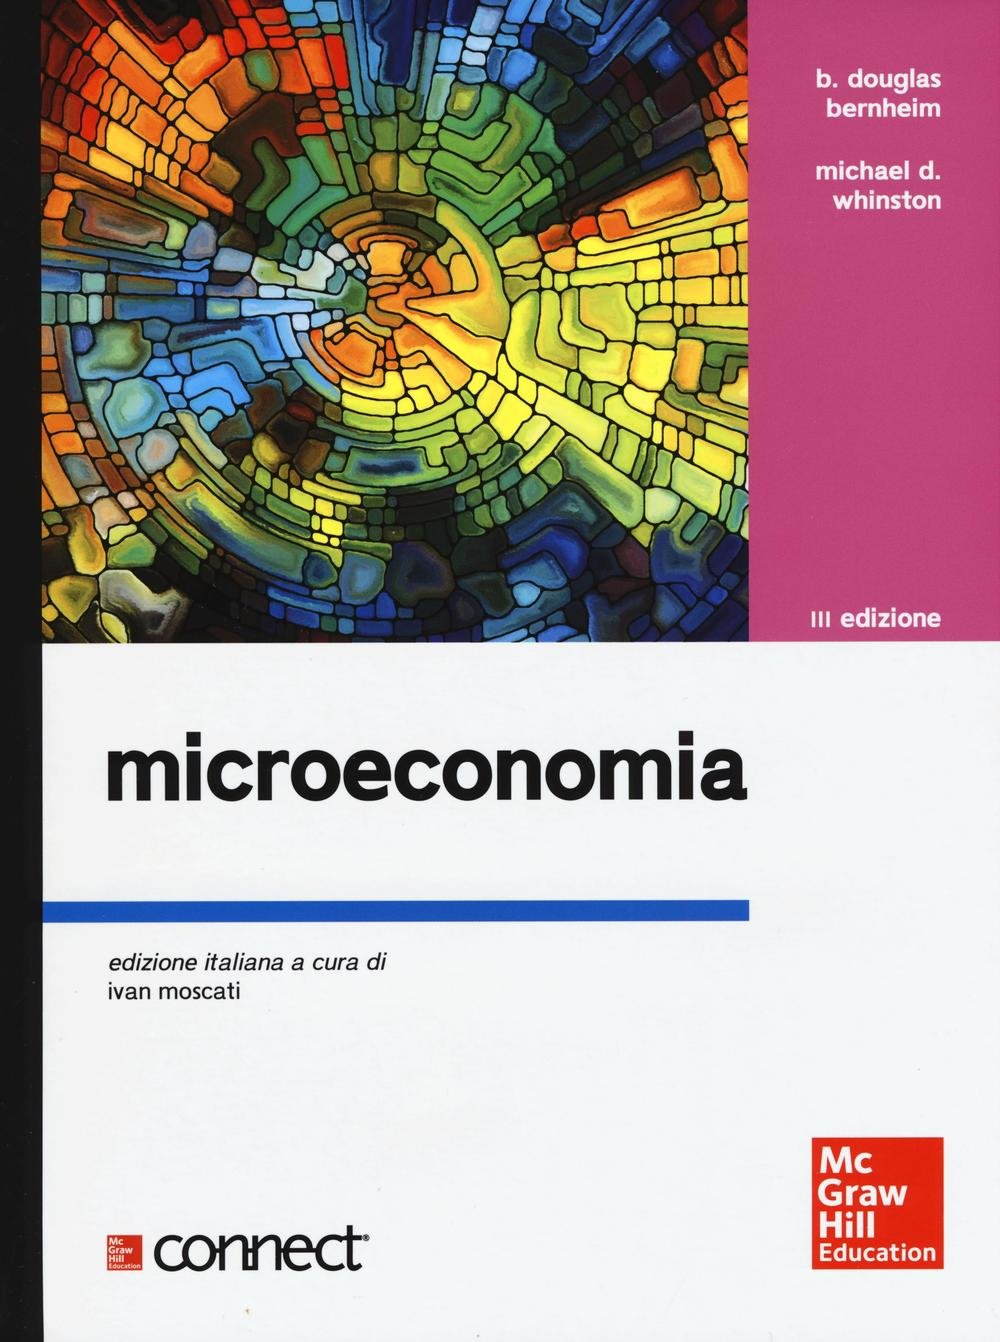 Microeconomia berheim